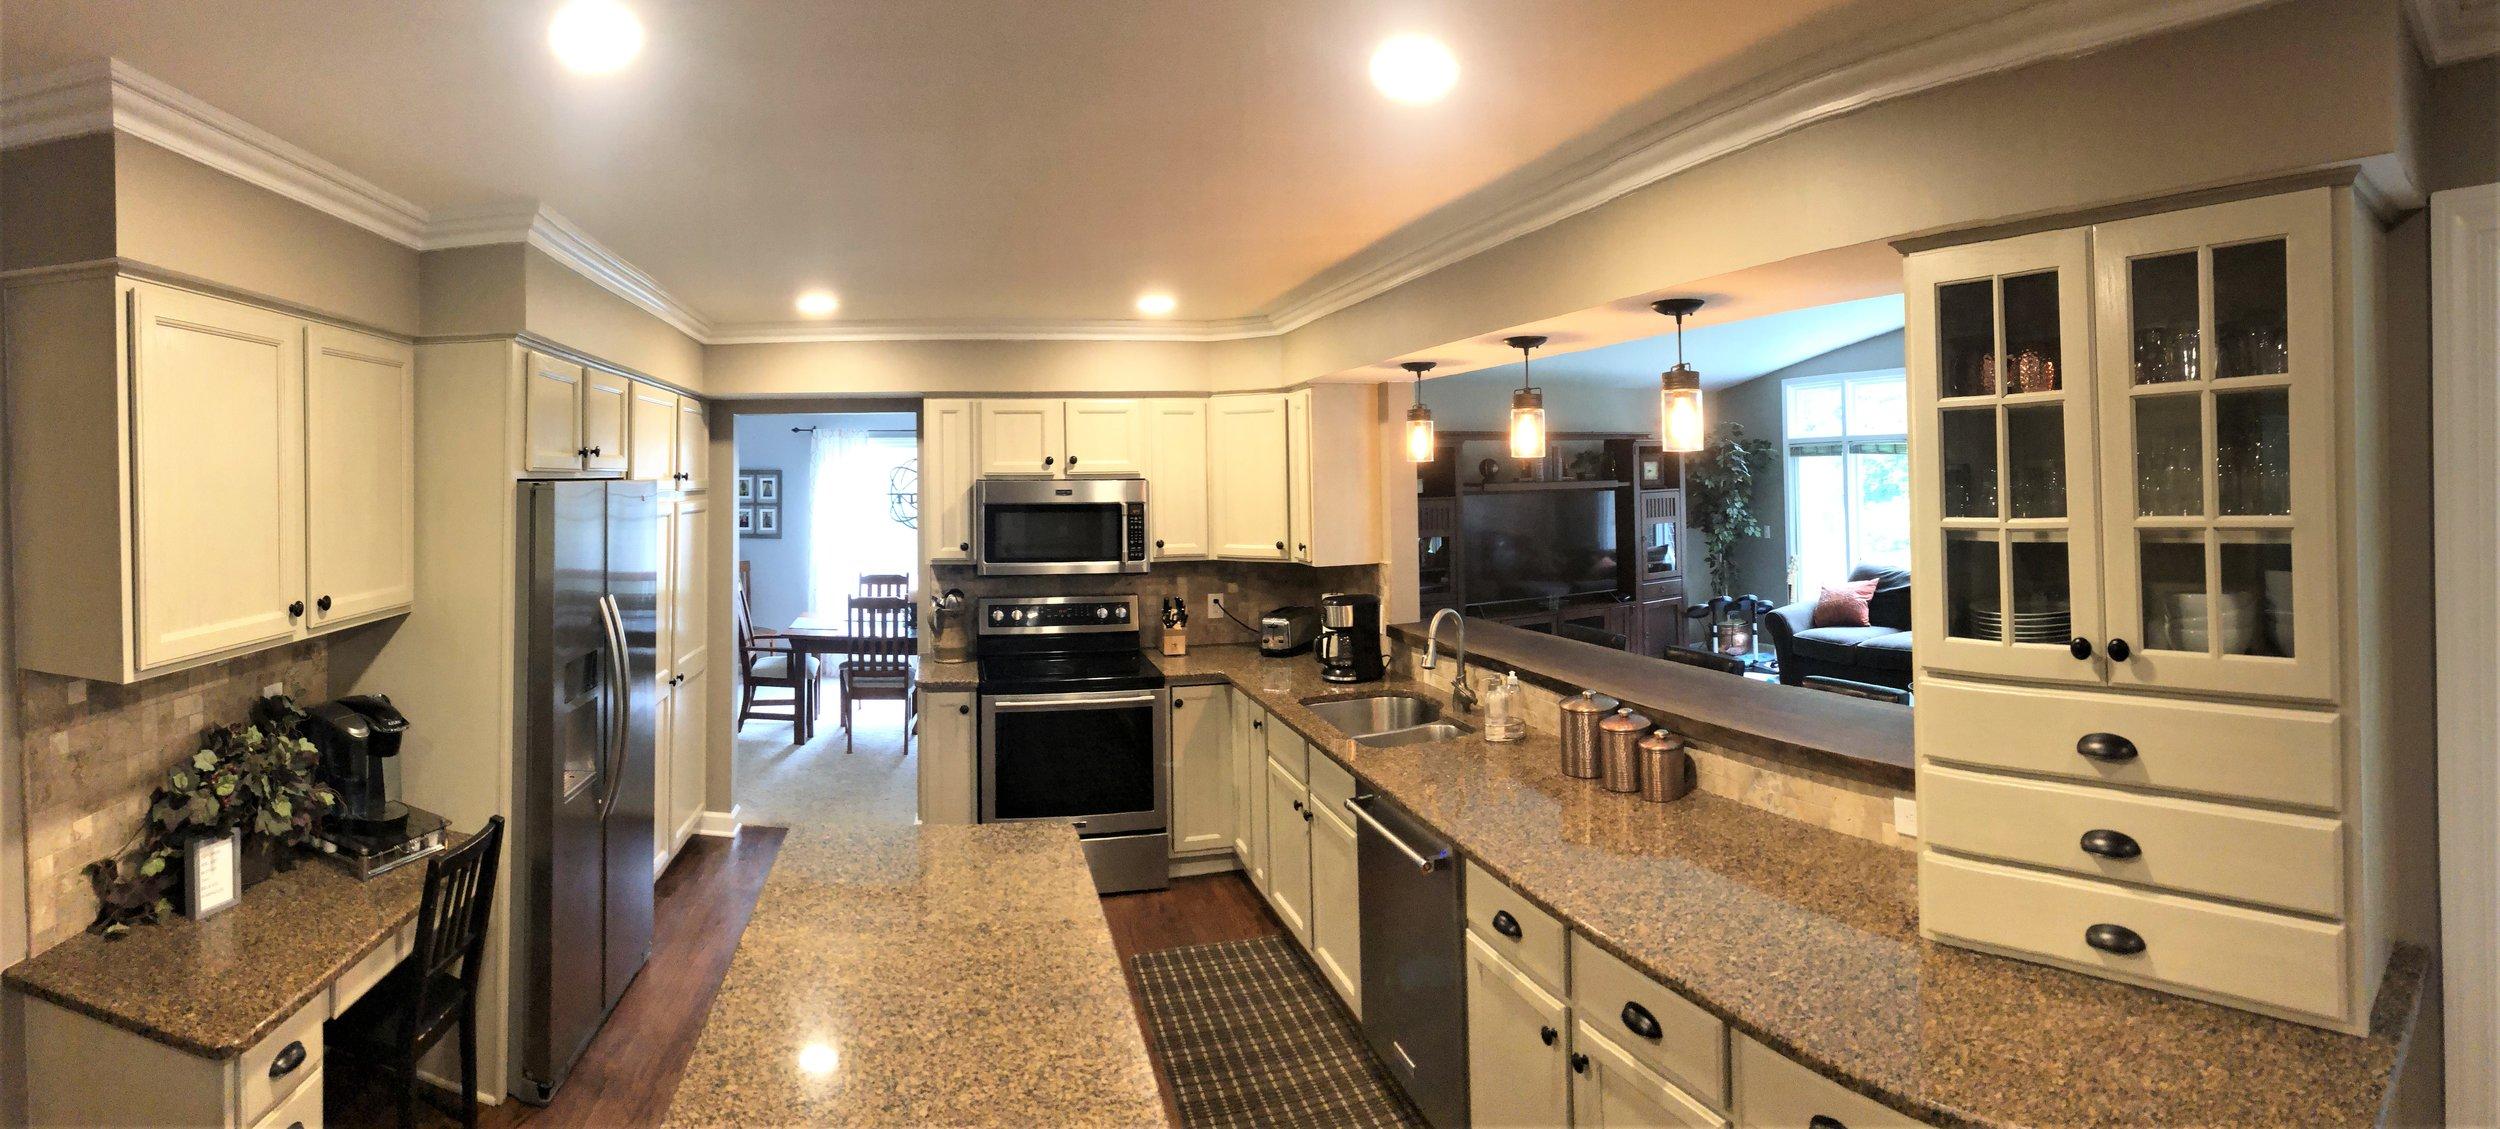 Complete open concept kitchen renovation.jpg